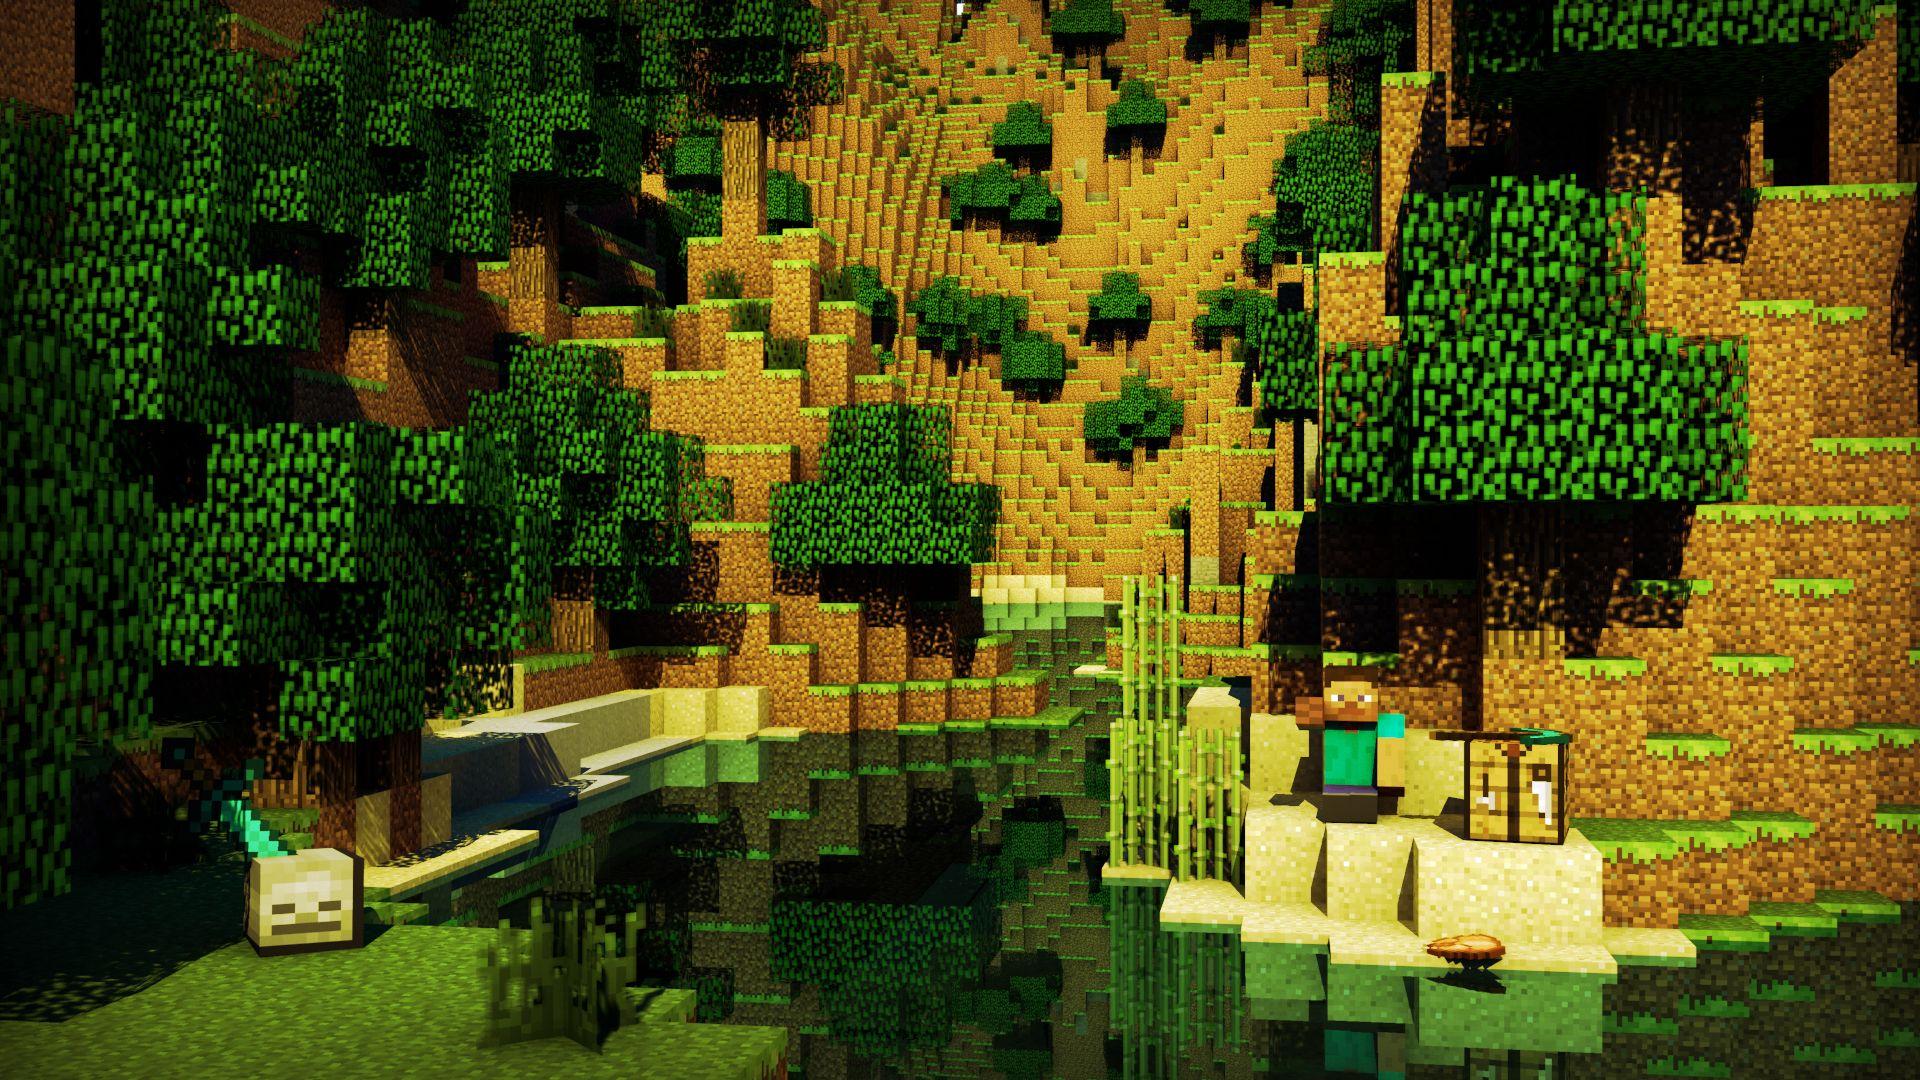 Cool Wallpaper Minecraft Love - d5b11ad76fa3b10152b363def6a1f66a  Perfect Image Reference_604516.jpg